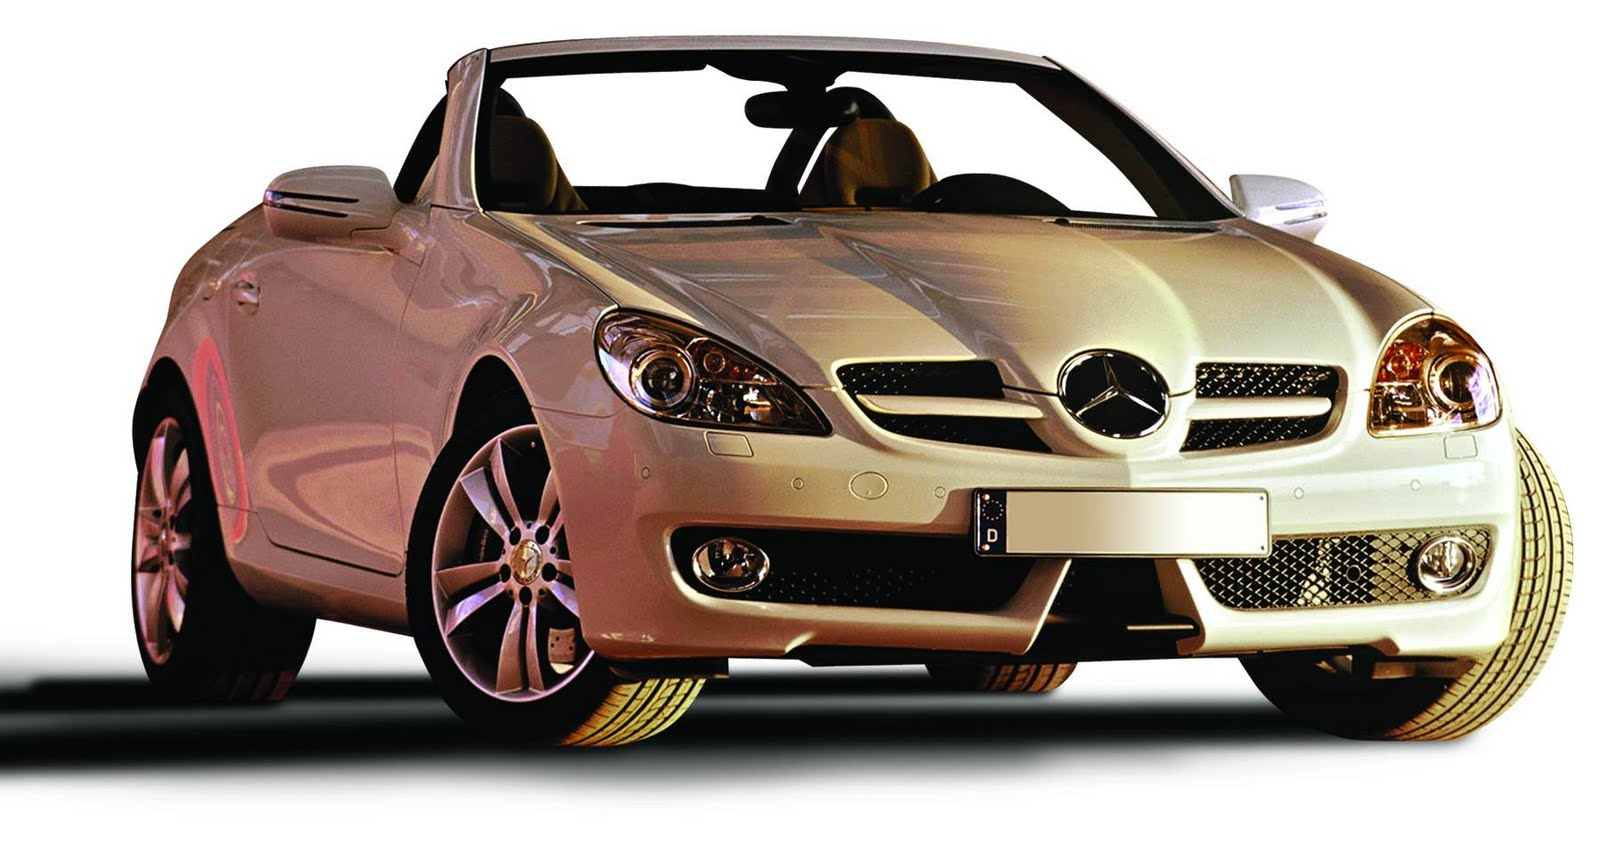 Mercedes 2000 casino